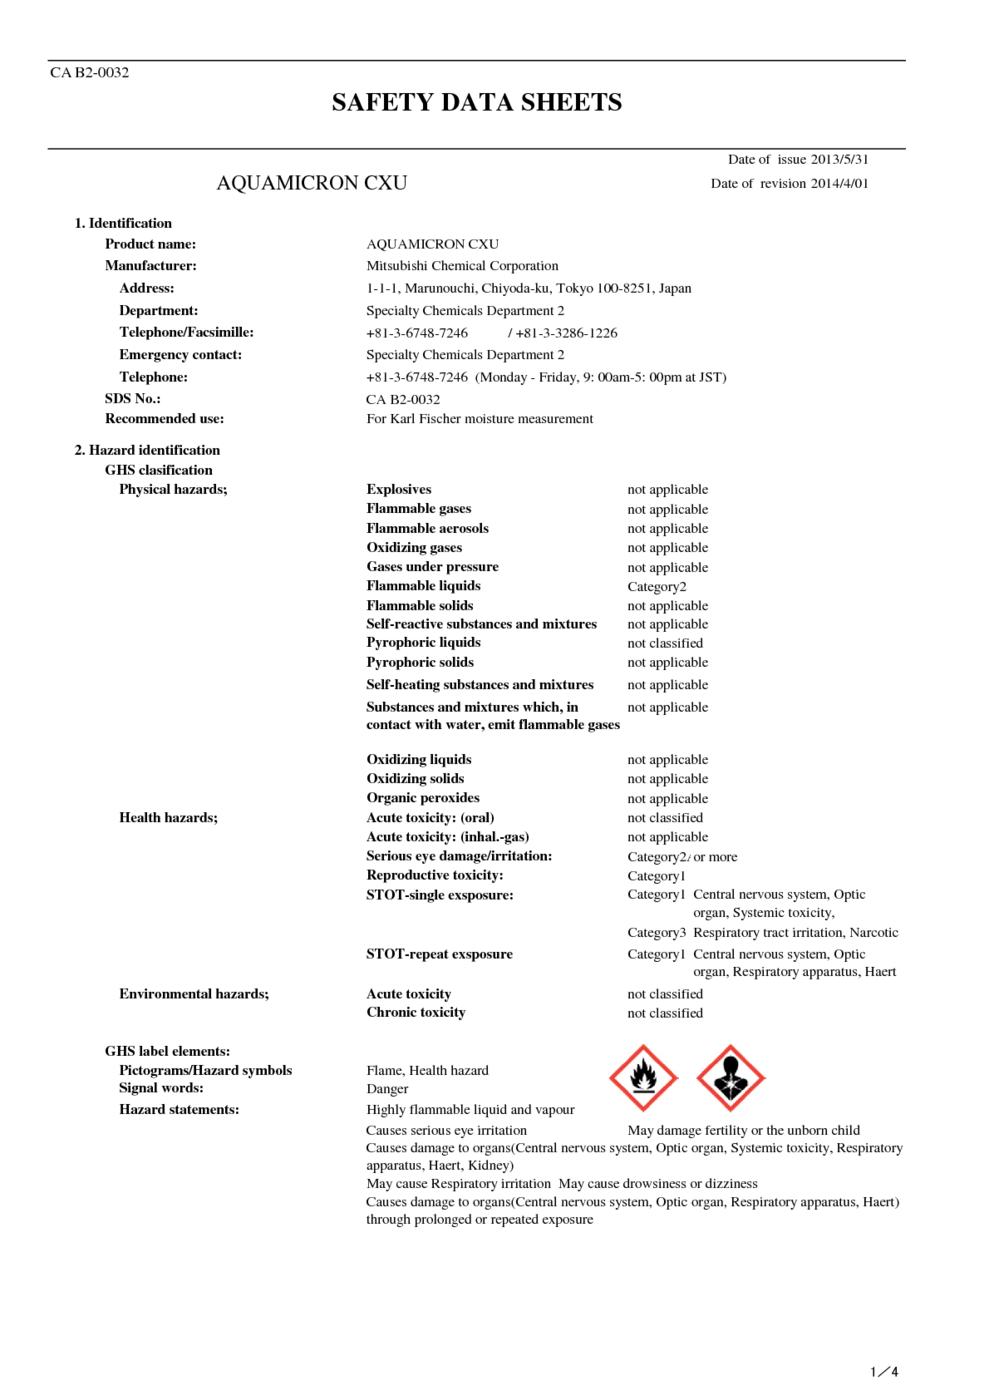 AQUAMICRON CXU MSDS Download